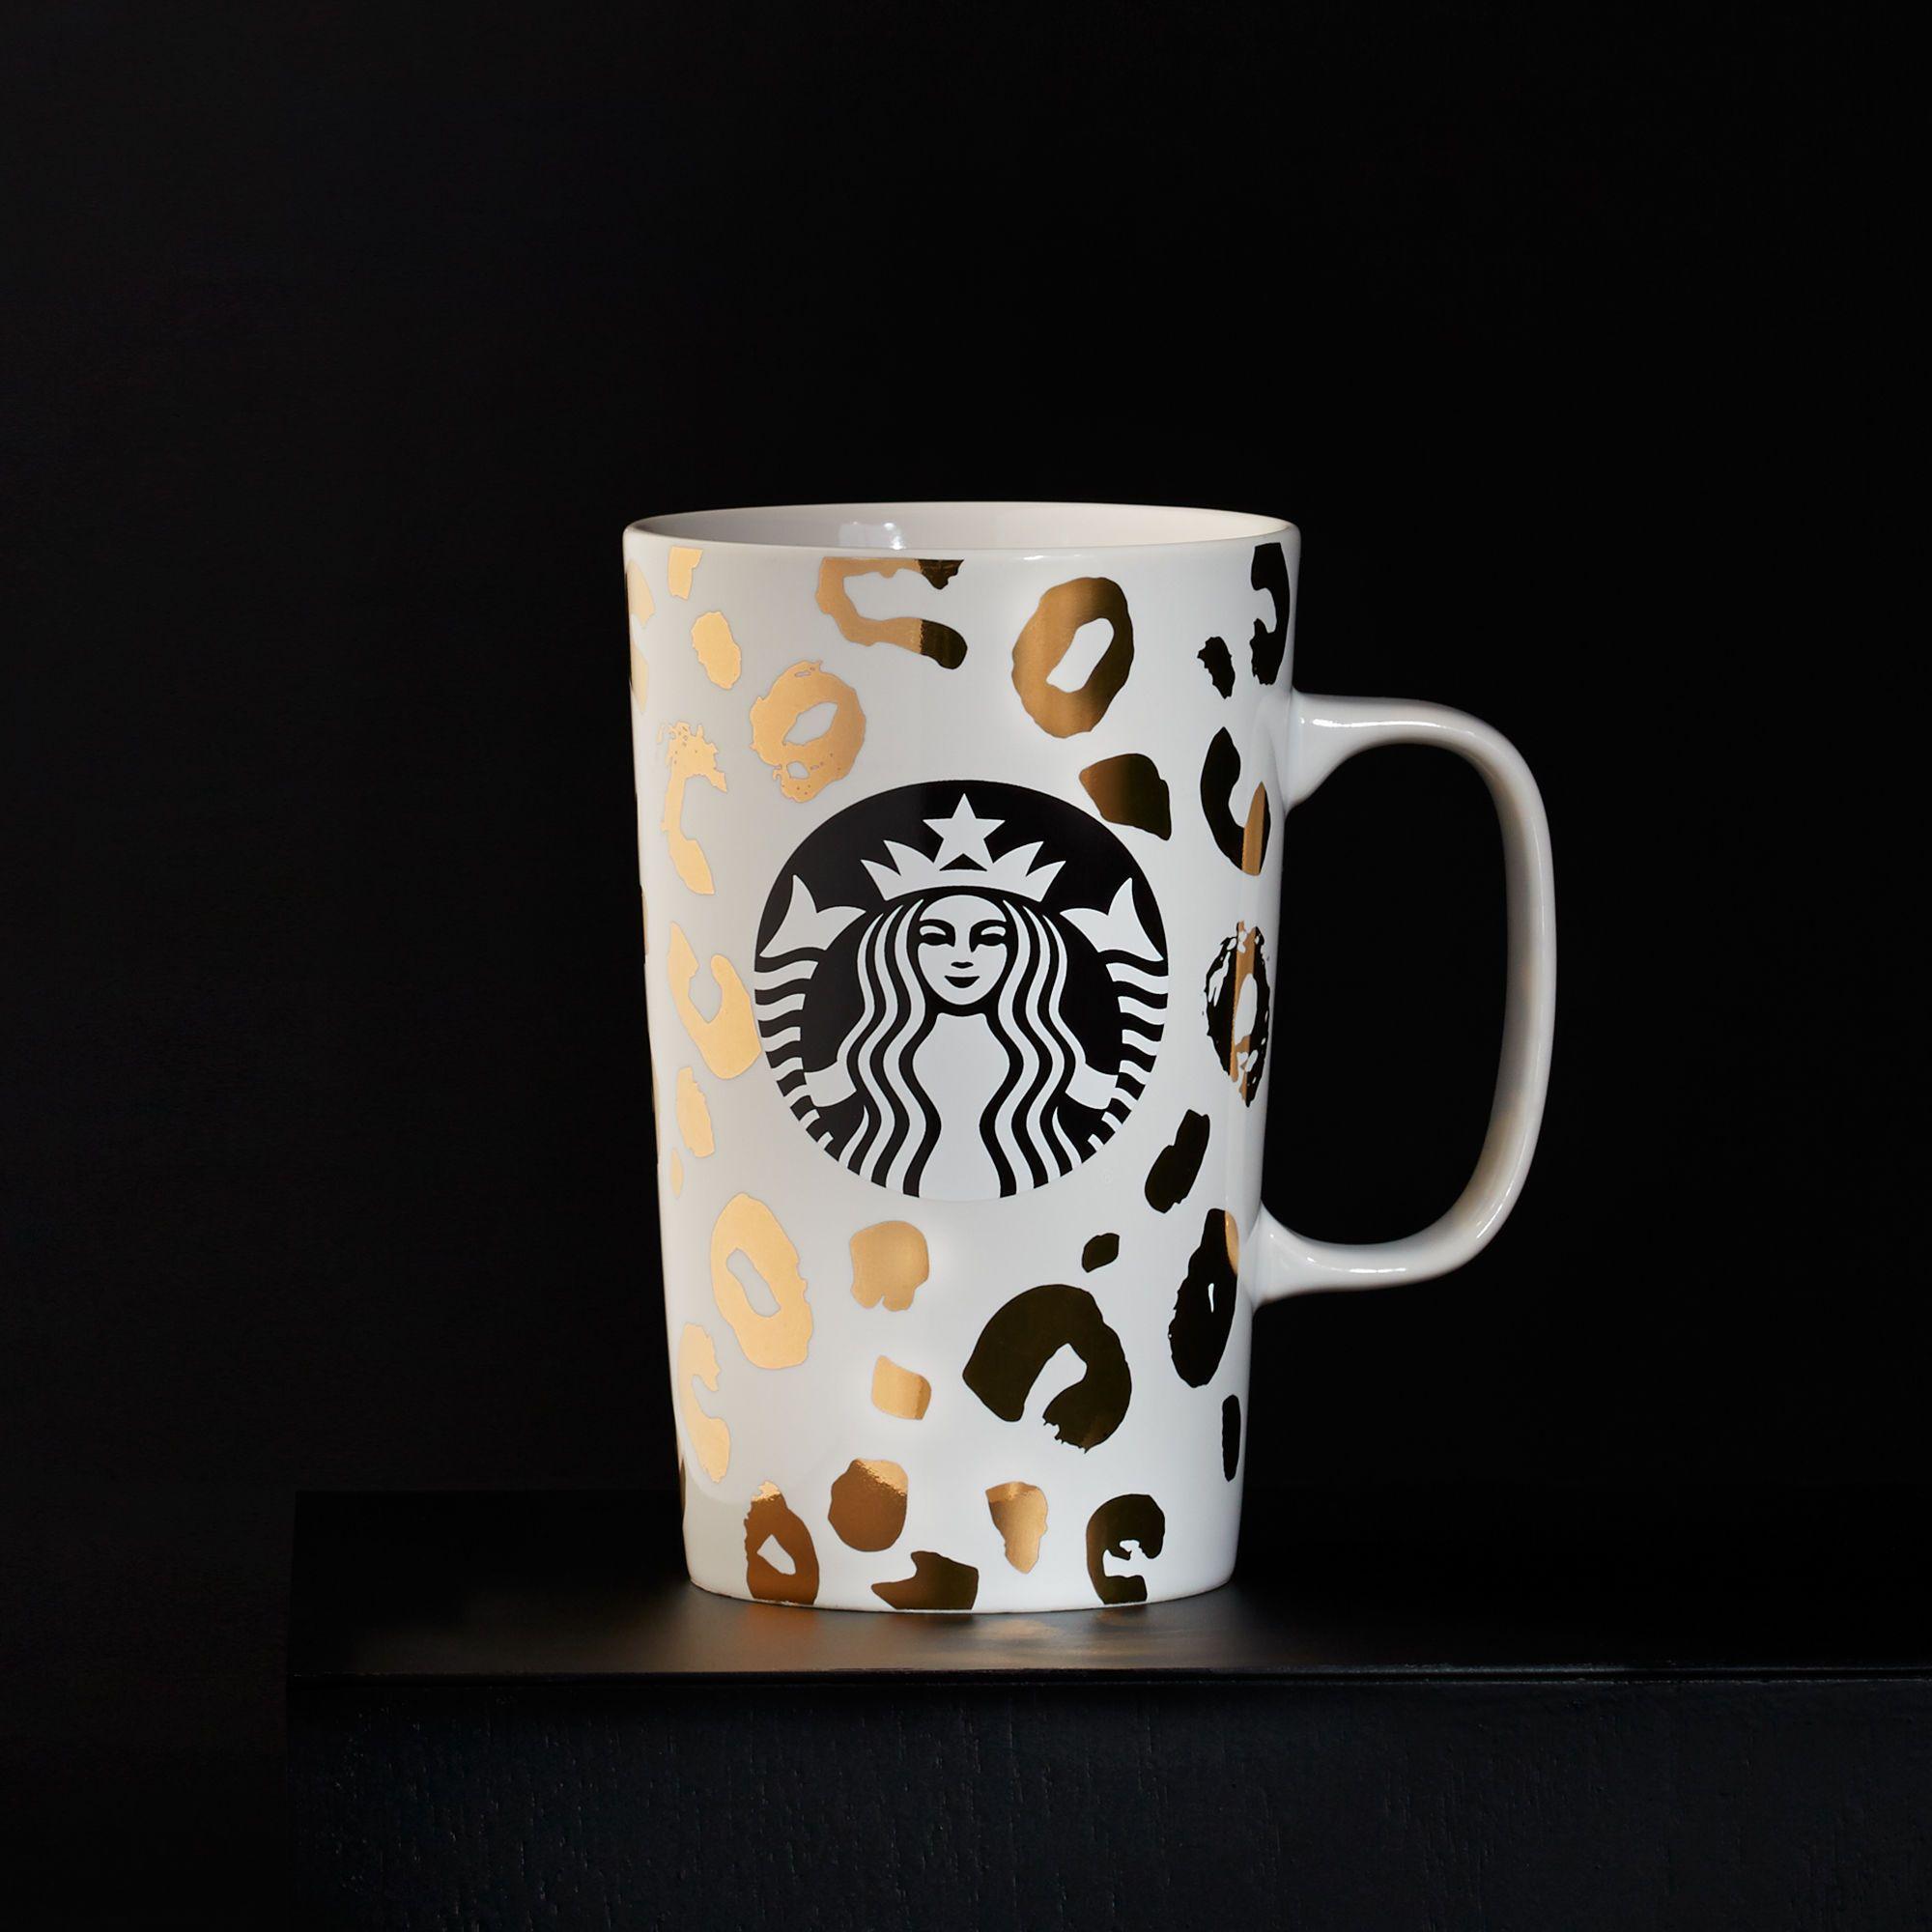 Starbucks Leopard Coffee Mug Mugs, Starbucks christmas